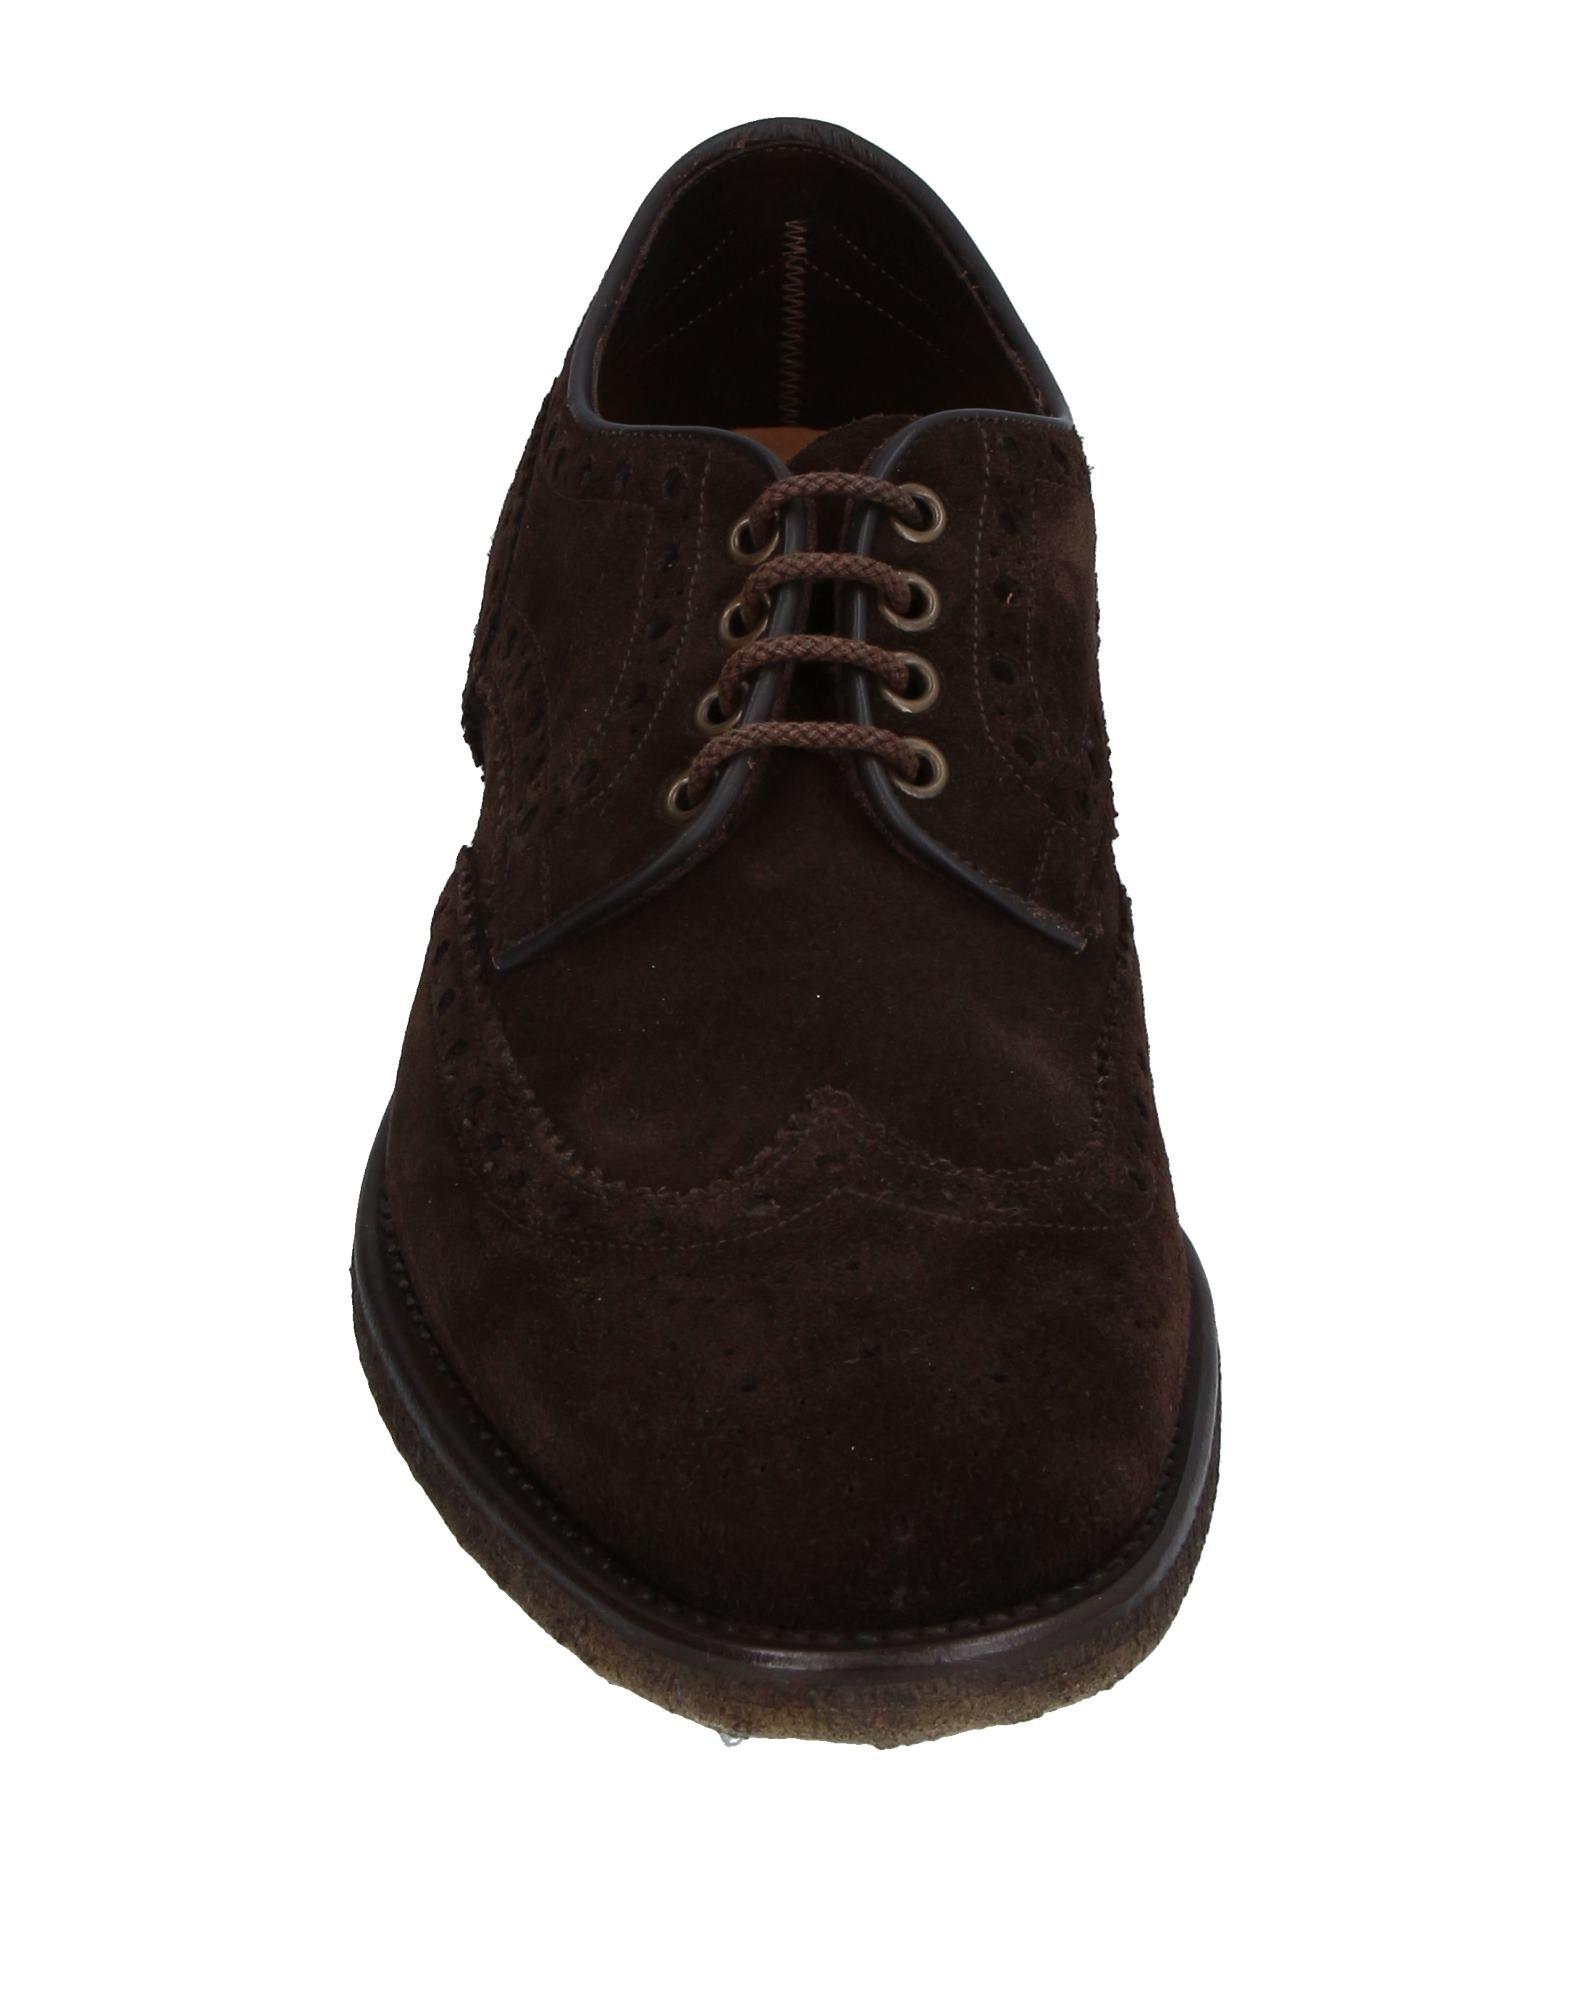 Regain Schnürschuhe Herren  11223496TL 11223496TL 11223496TL Heiße Schuhe 44a005